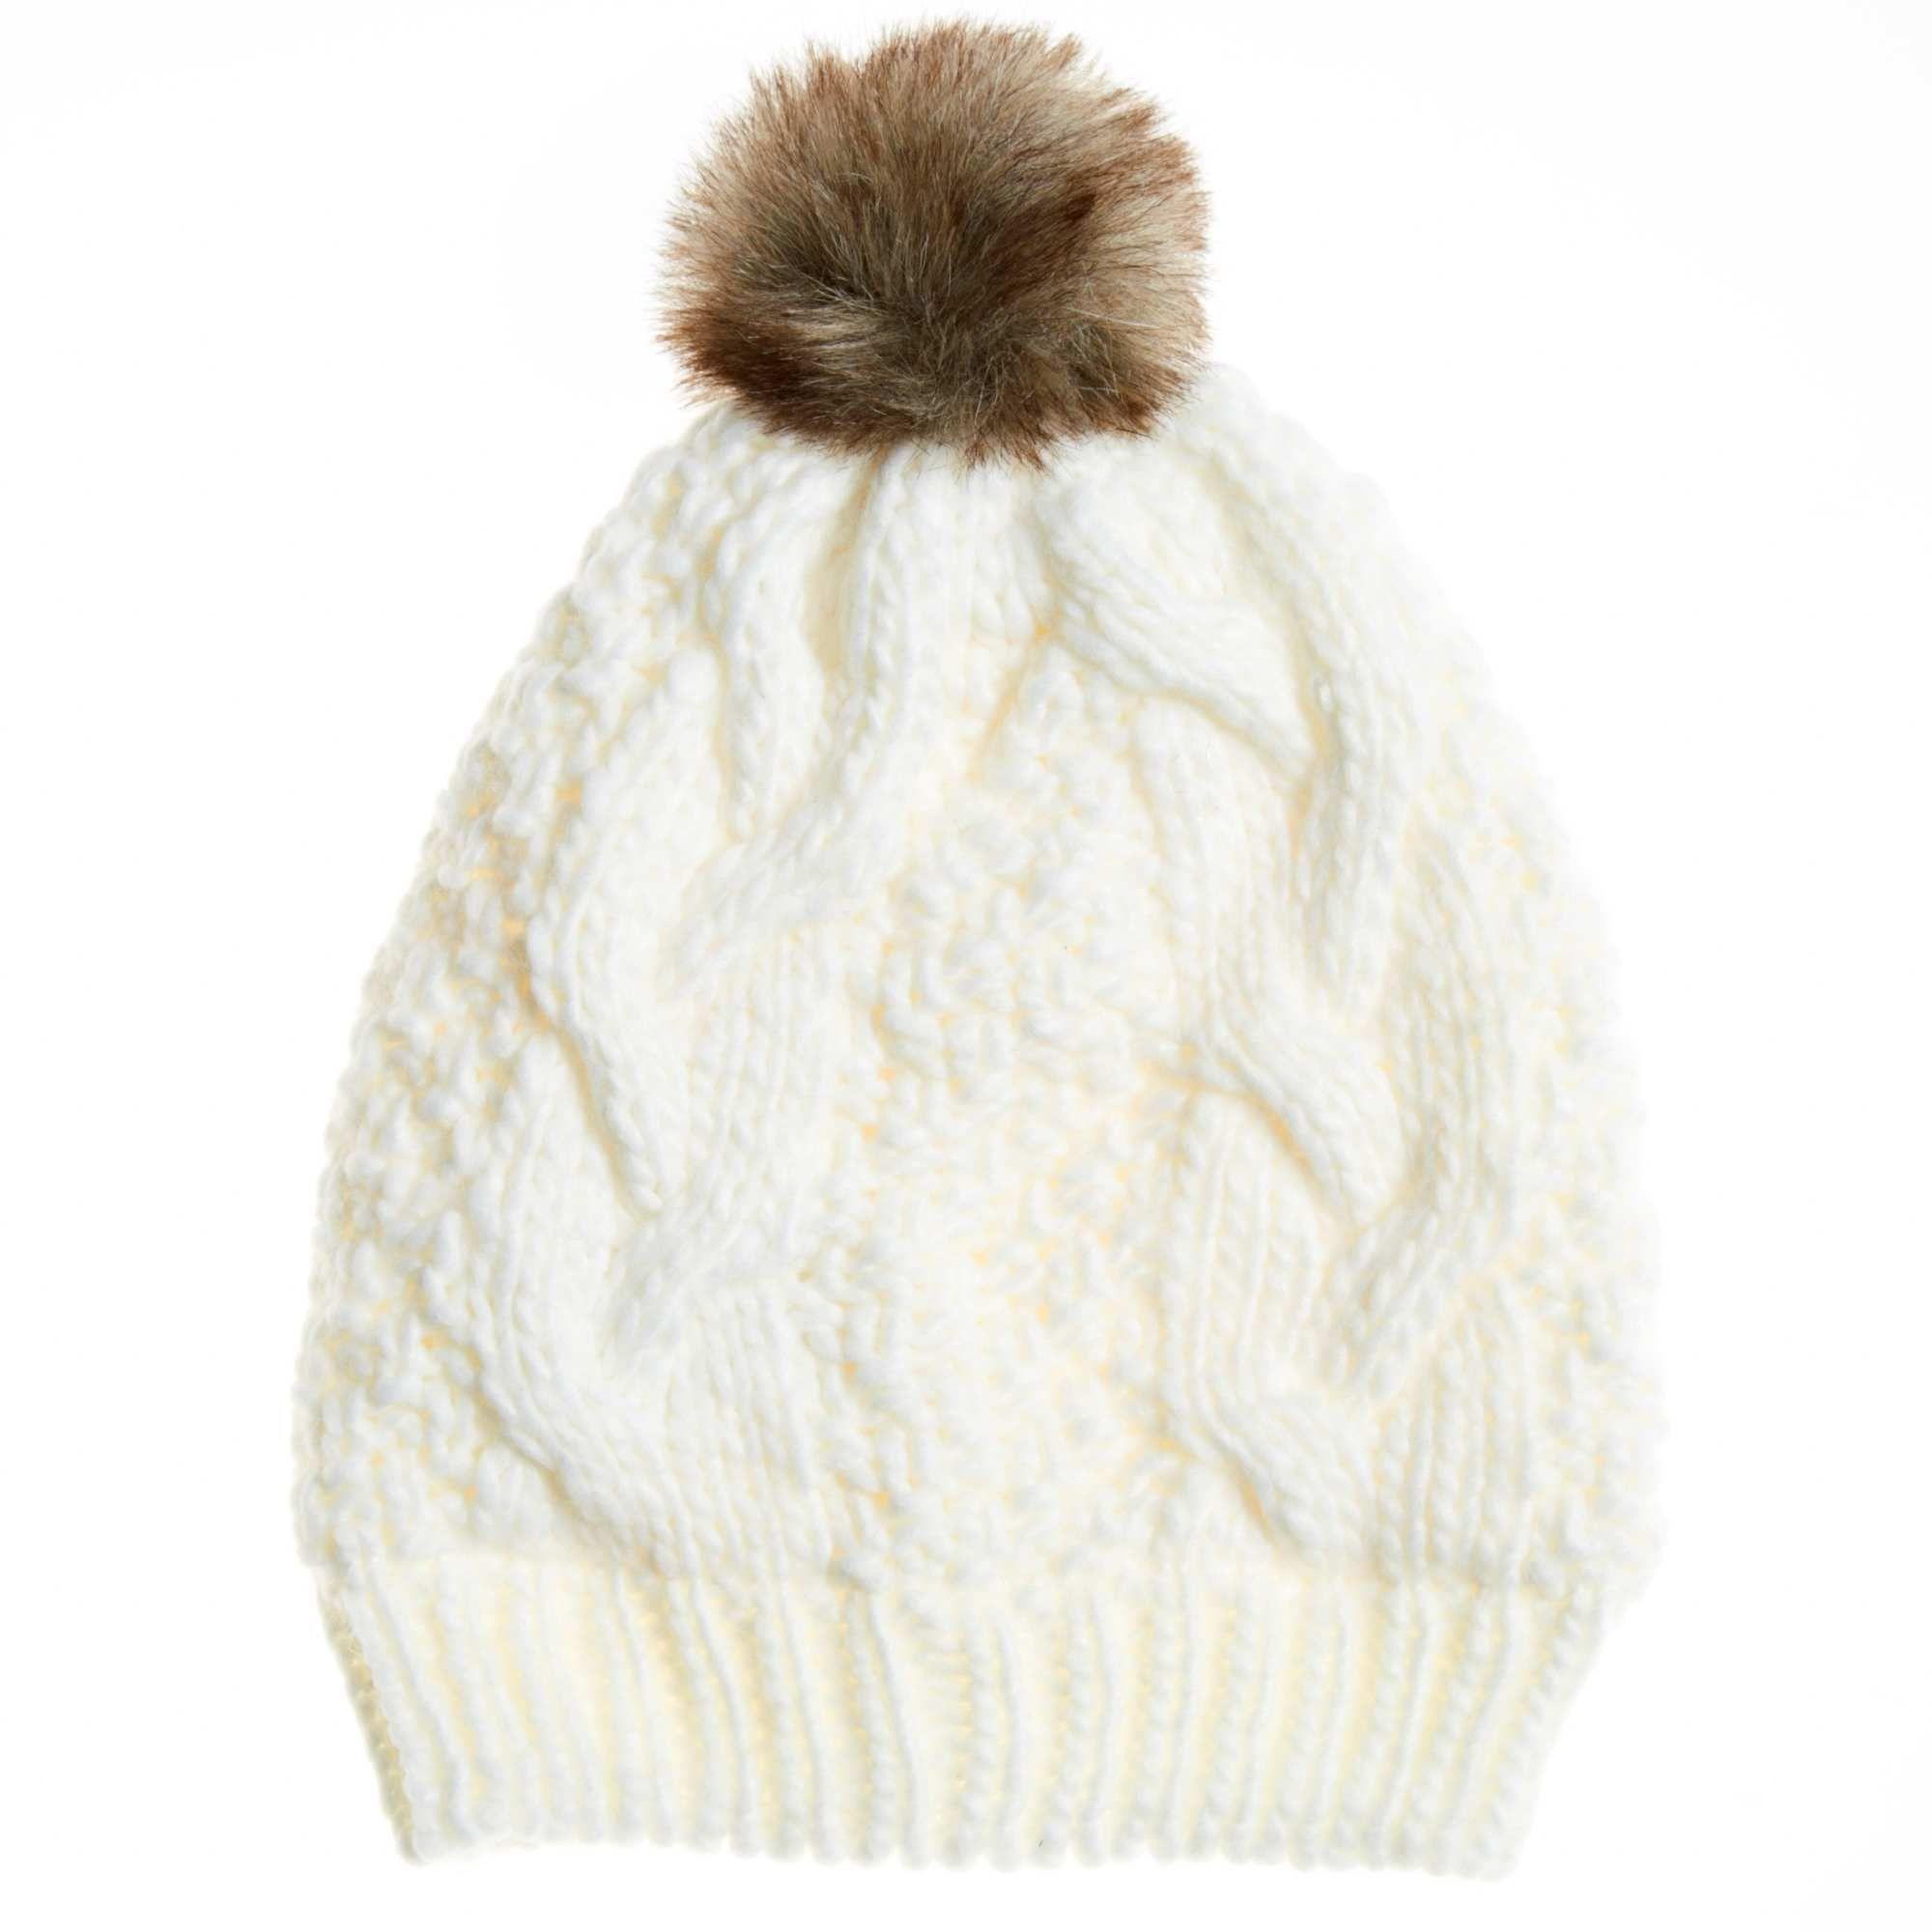 cb081fea67f2a Gorro con forro de tejido polar y pompón blanco nieve Mujer